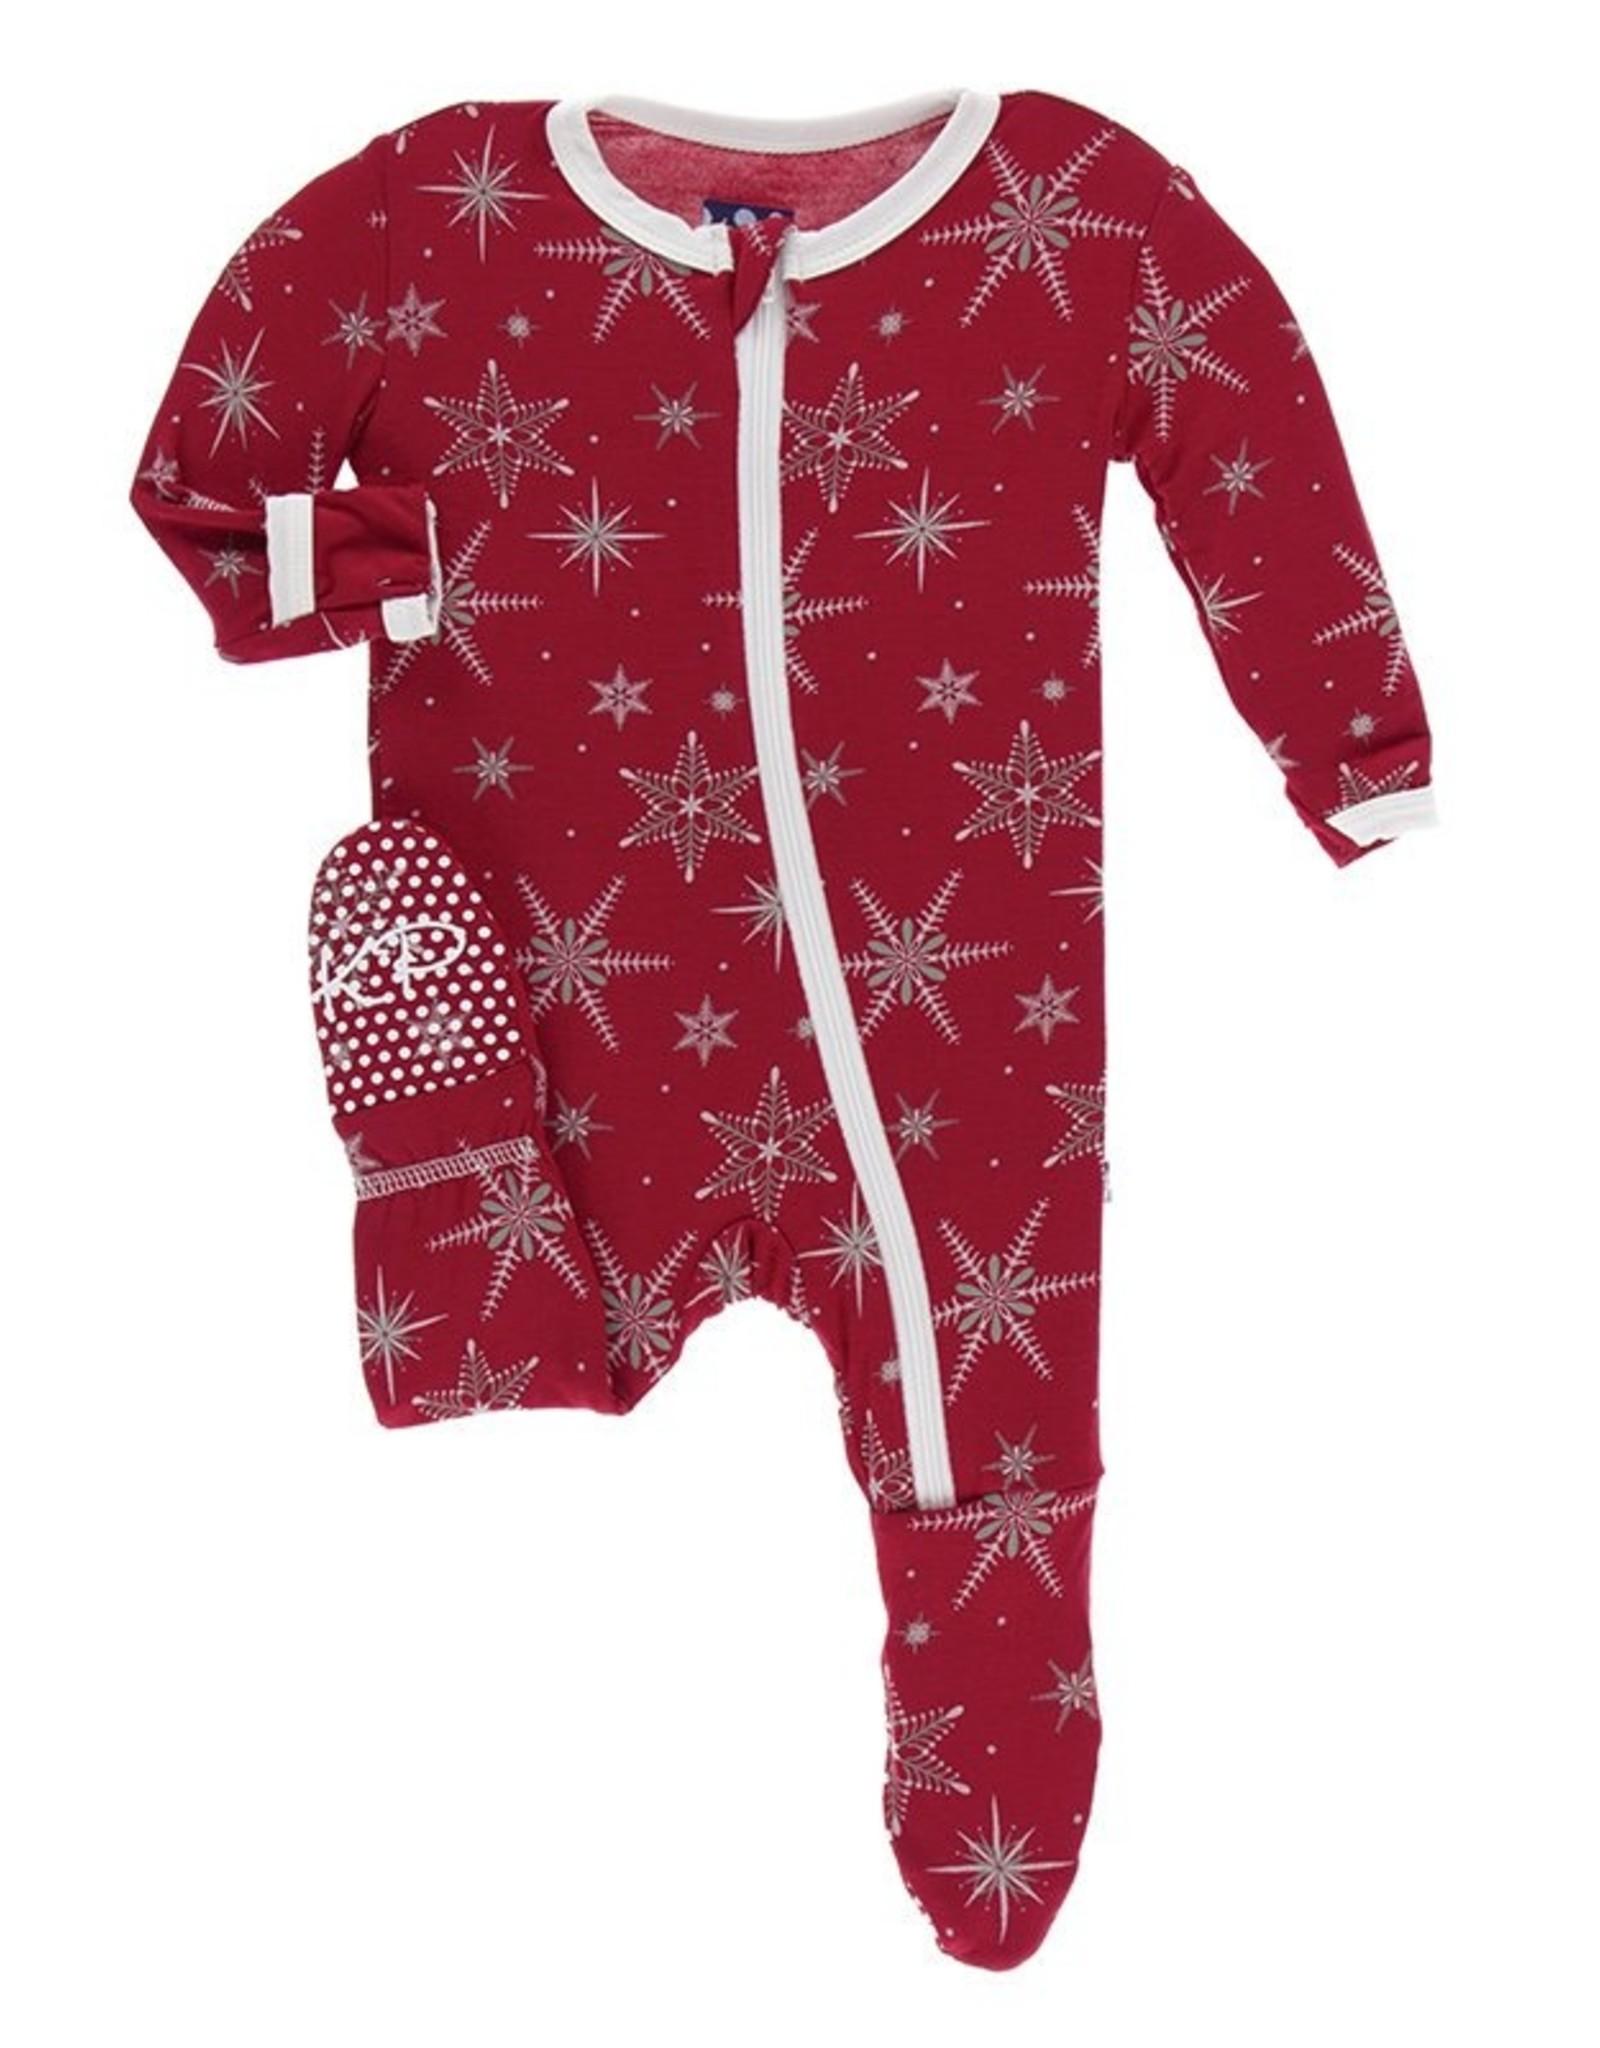 KicKee Pants KicKee Pant - Holiday Muffin Ruffle Footie with Zipper